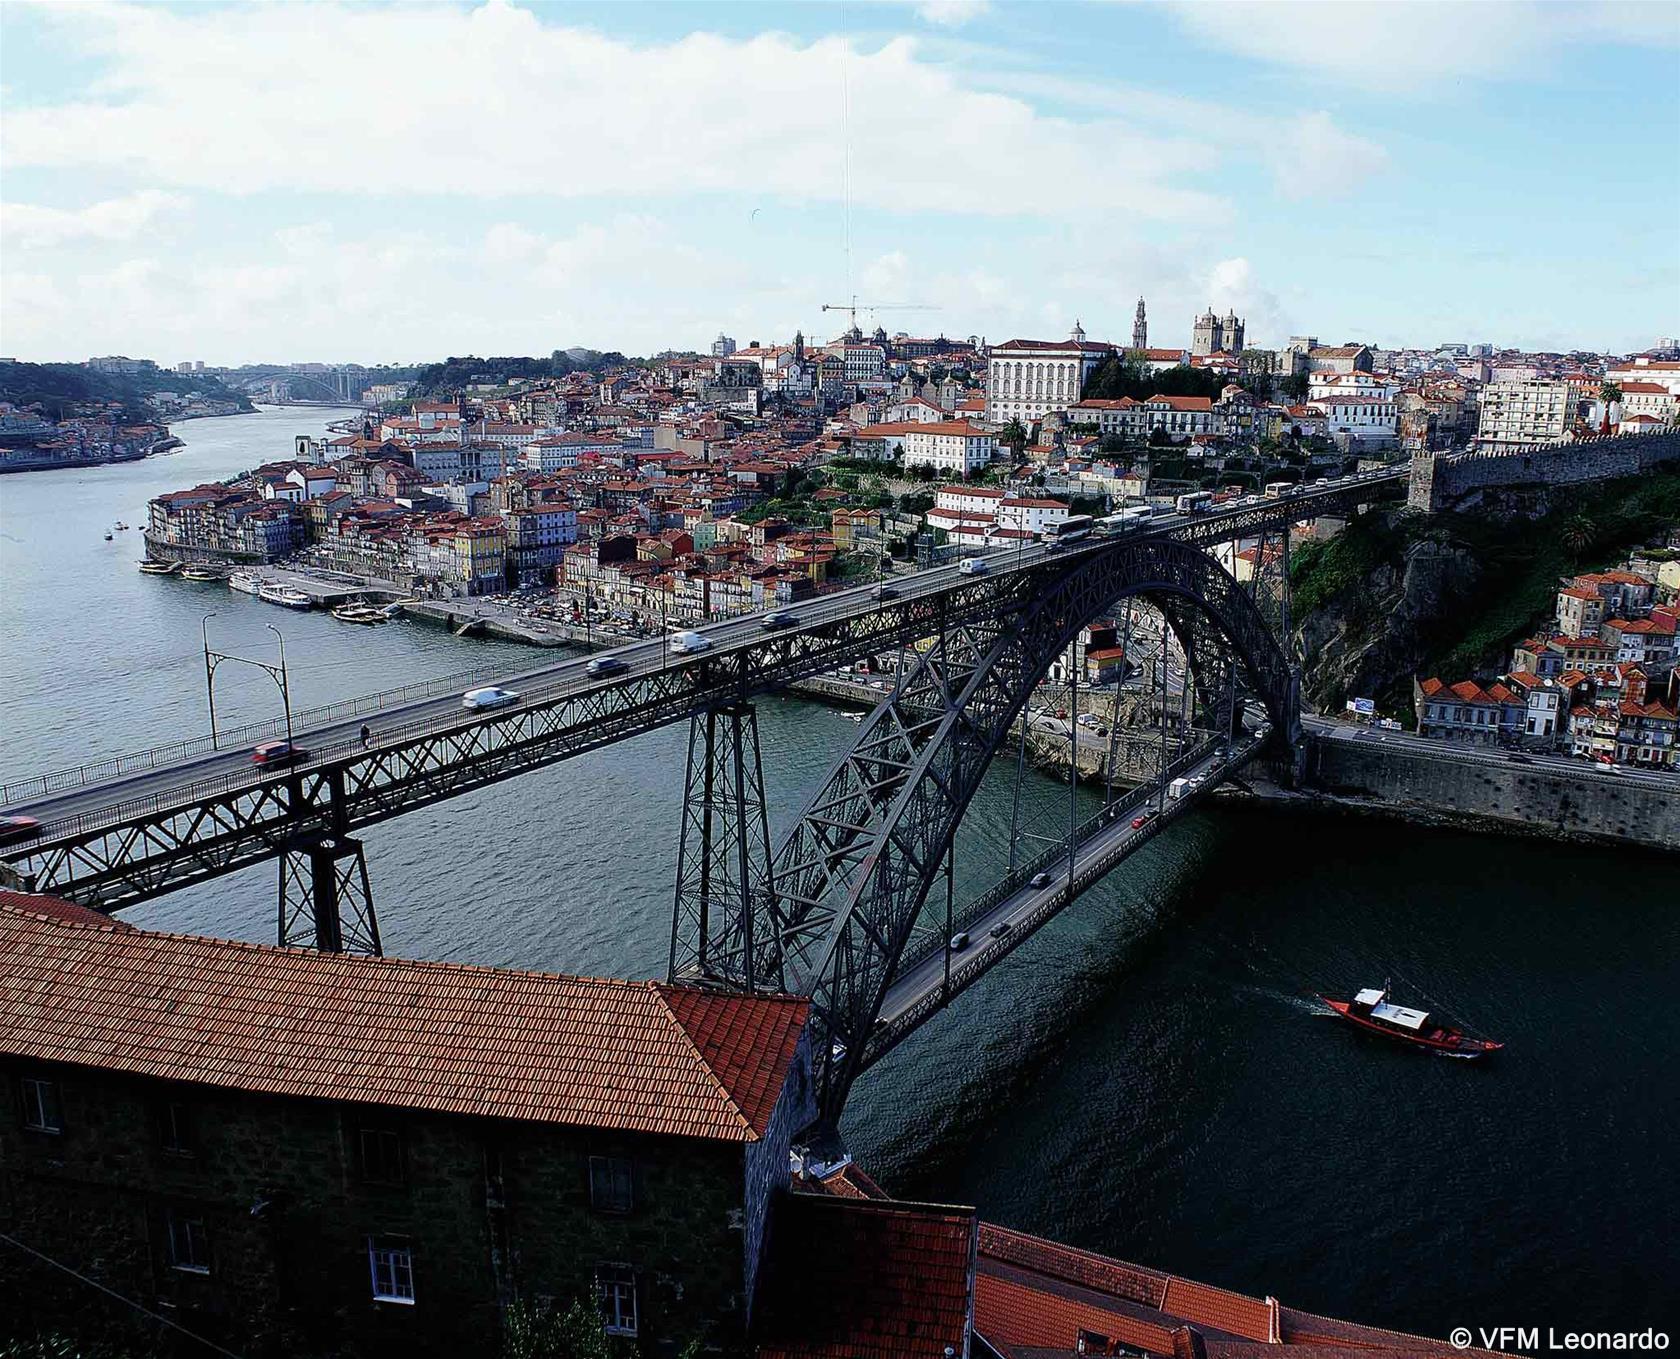 ibis budget Porto Gaia, Vila Nova de Gaia